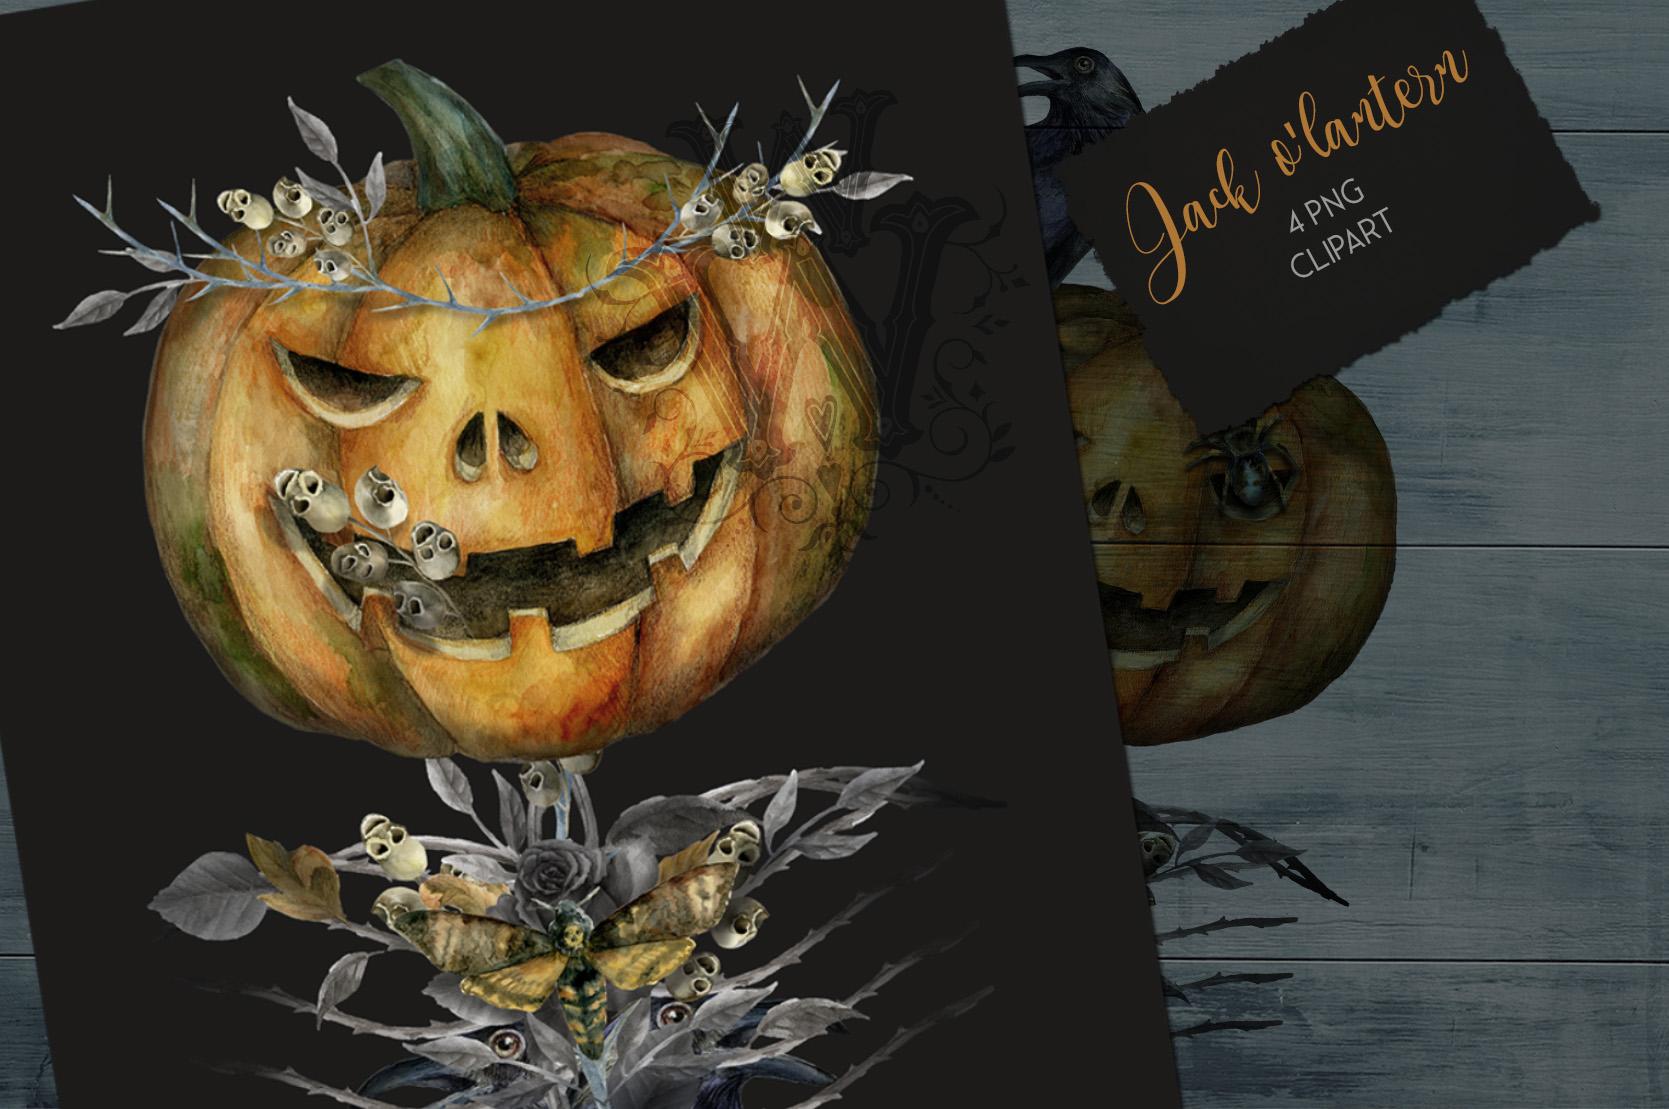 Jack o Lanter Halloween clipart, evil vintage gothic pumpkin example image 1